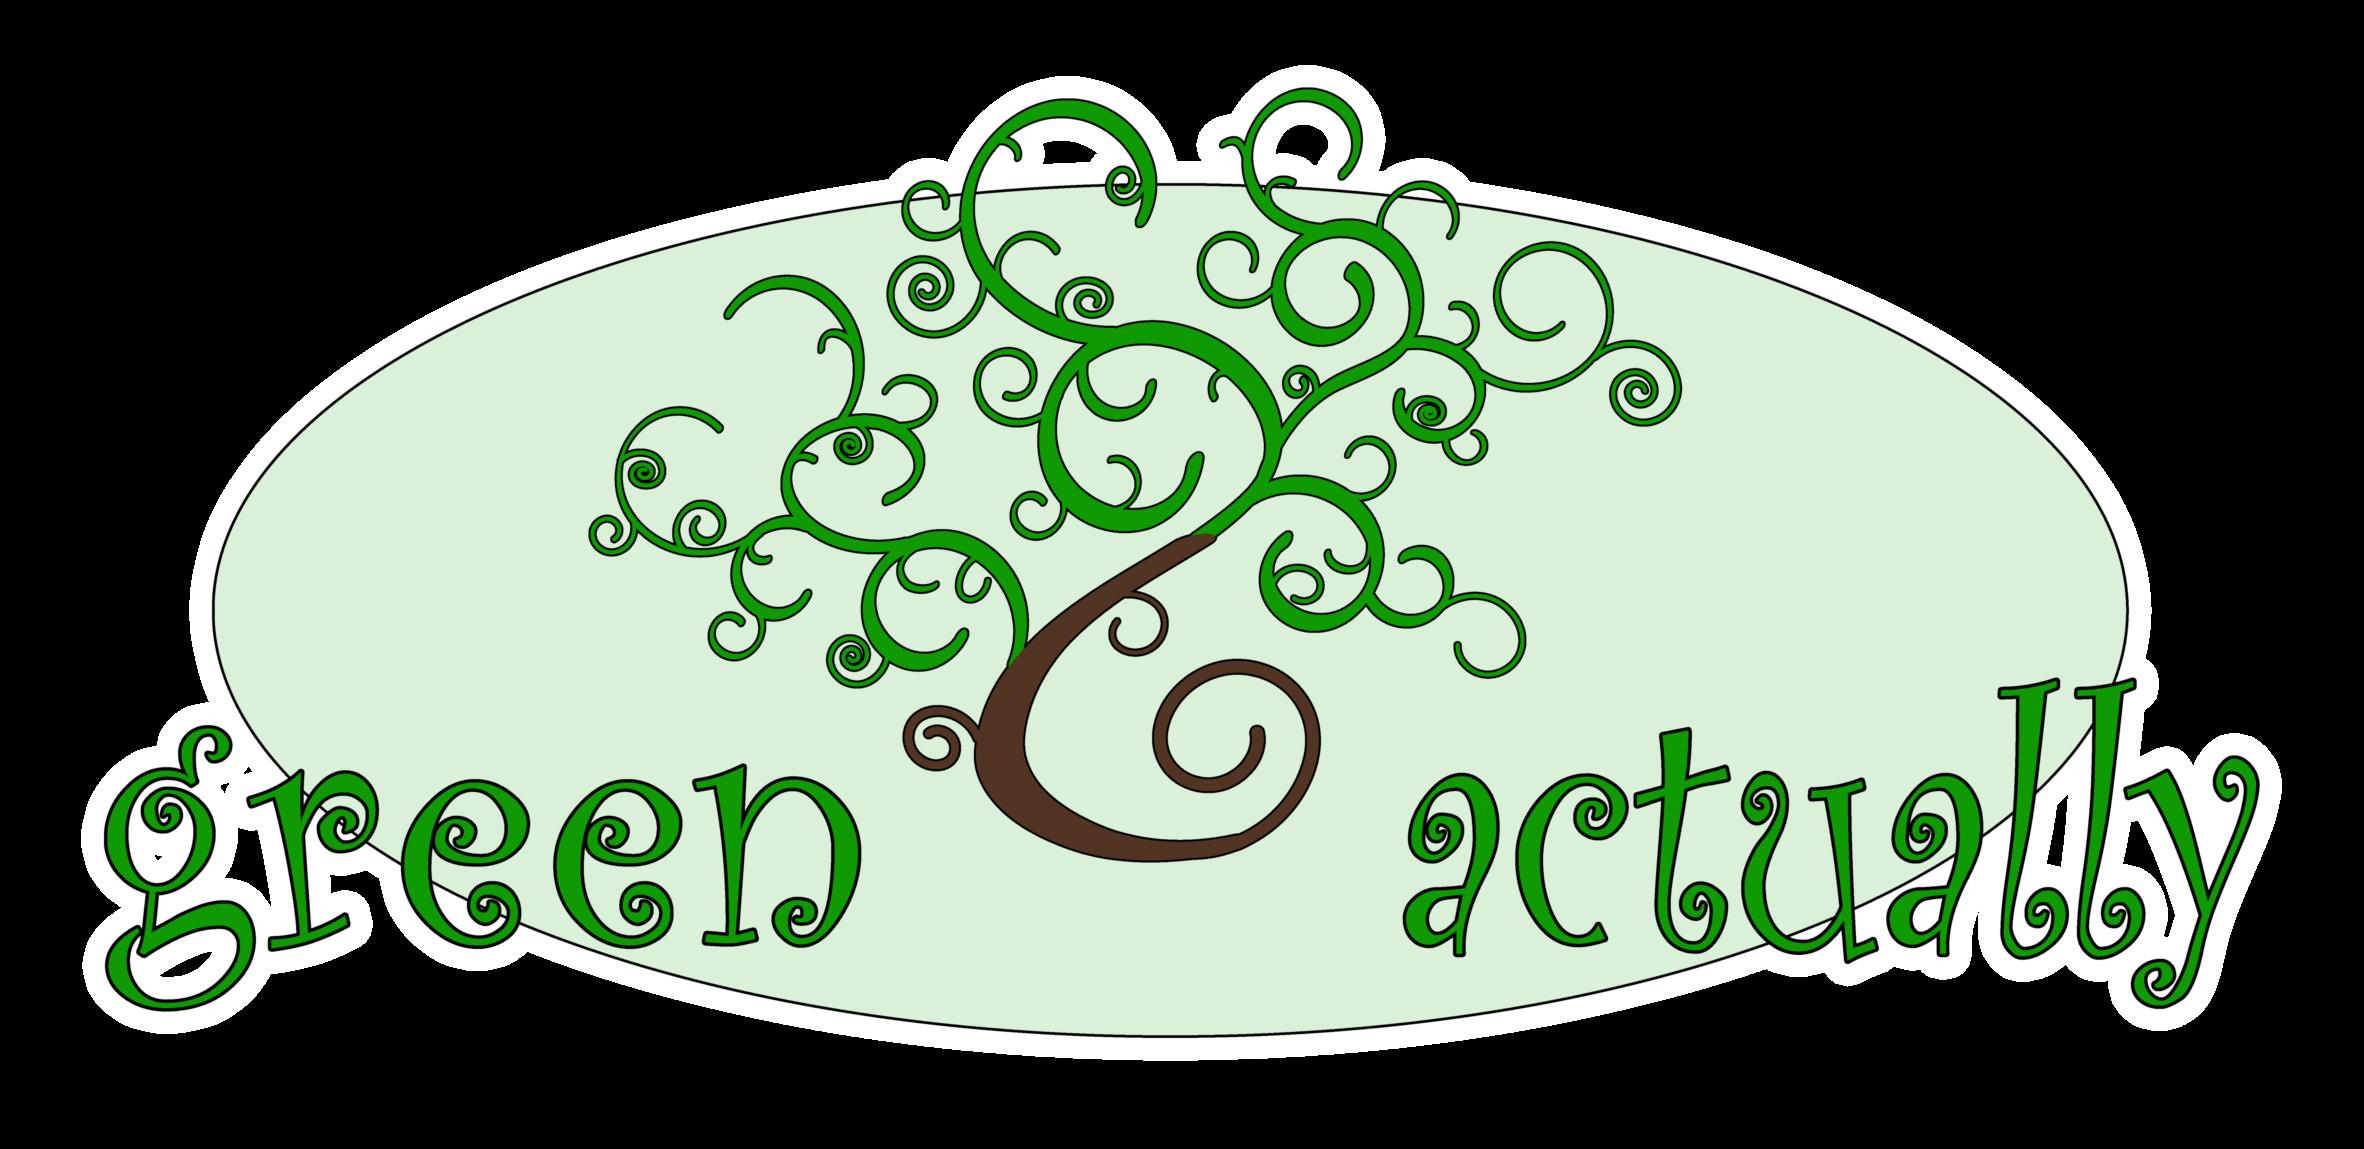 GreenActually